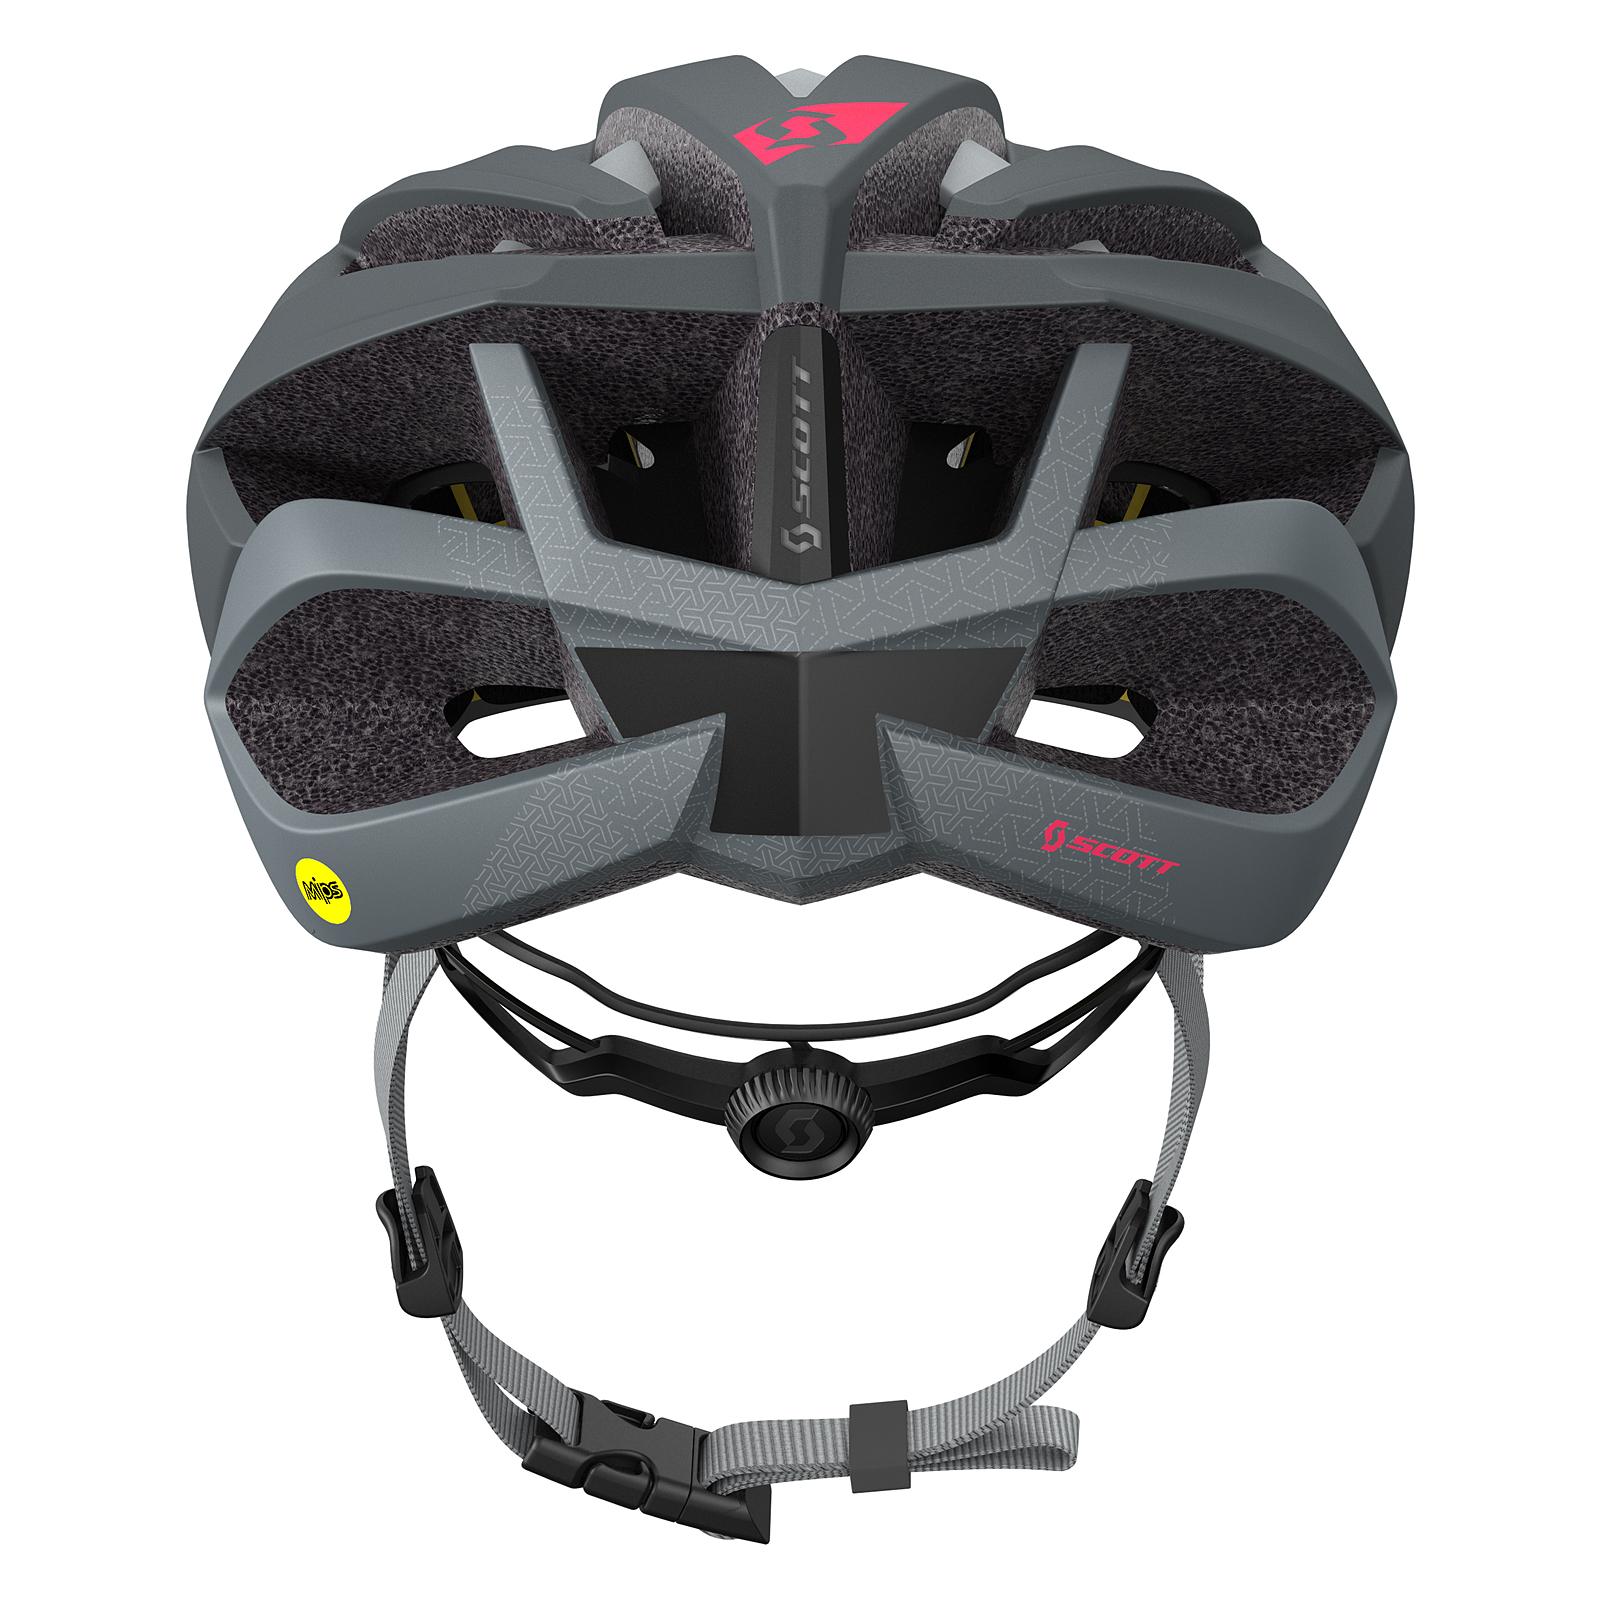 scott arx mtb plus fahrrad helm grau 2018 von top marken. Black Bedroom Furniture Sets. Home Design Ideas